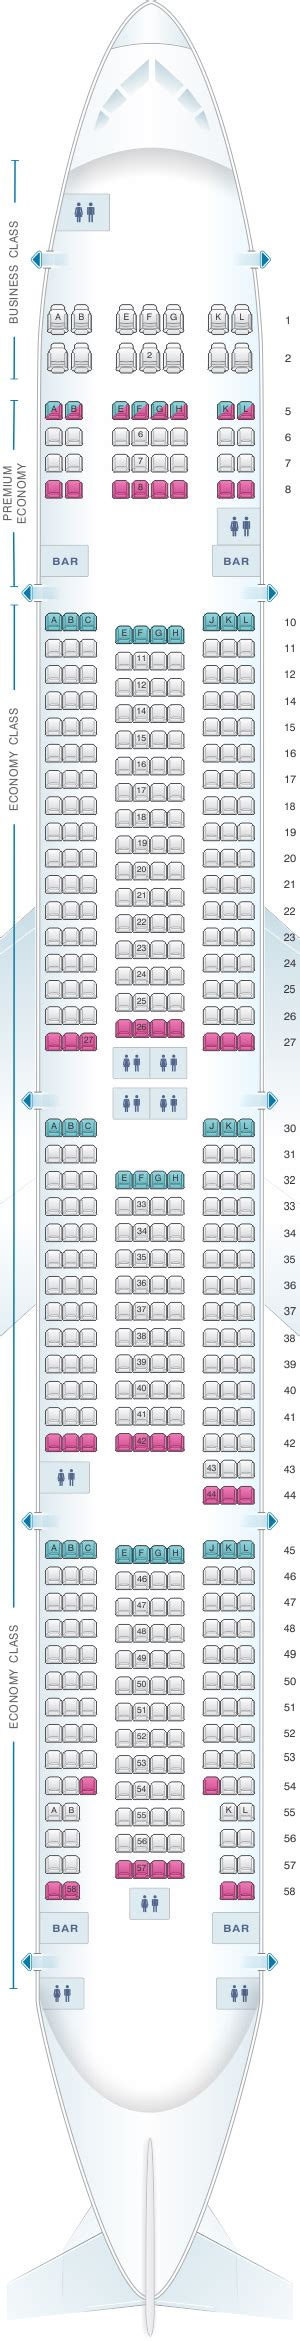 plan siege boeing 777 300er plan de cabine air boeing b777 300 haul